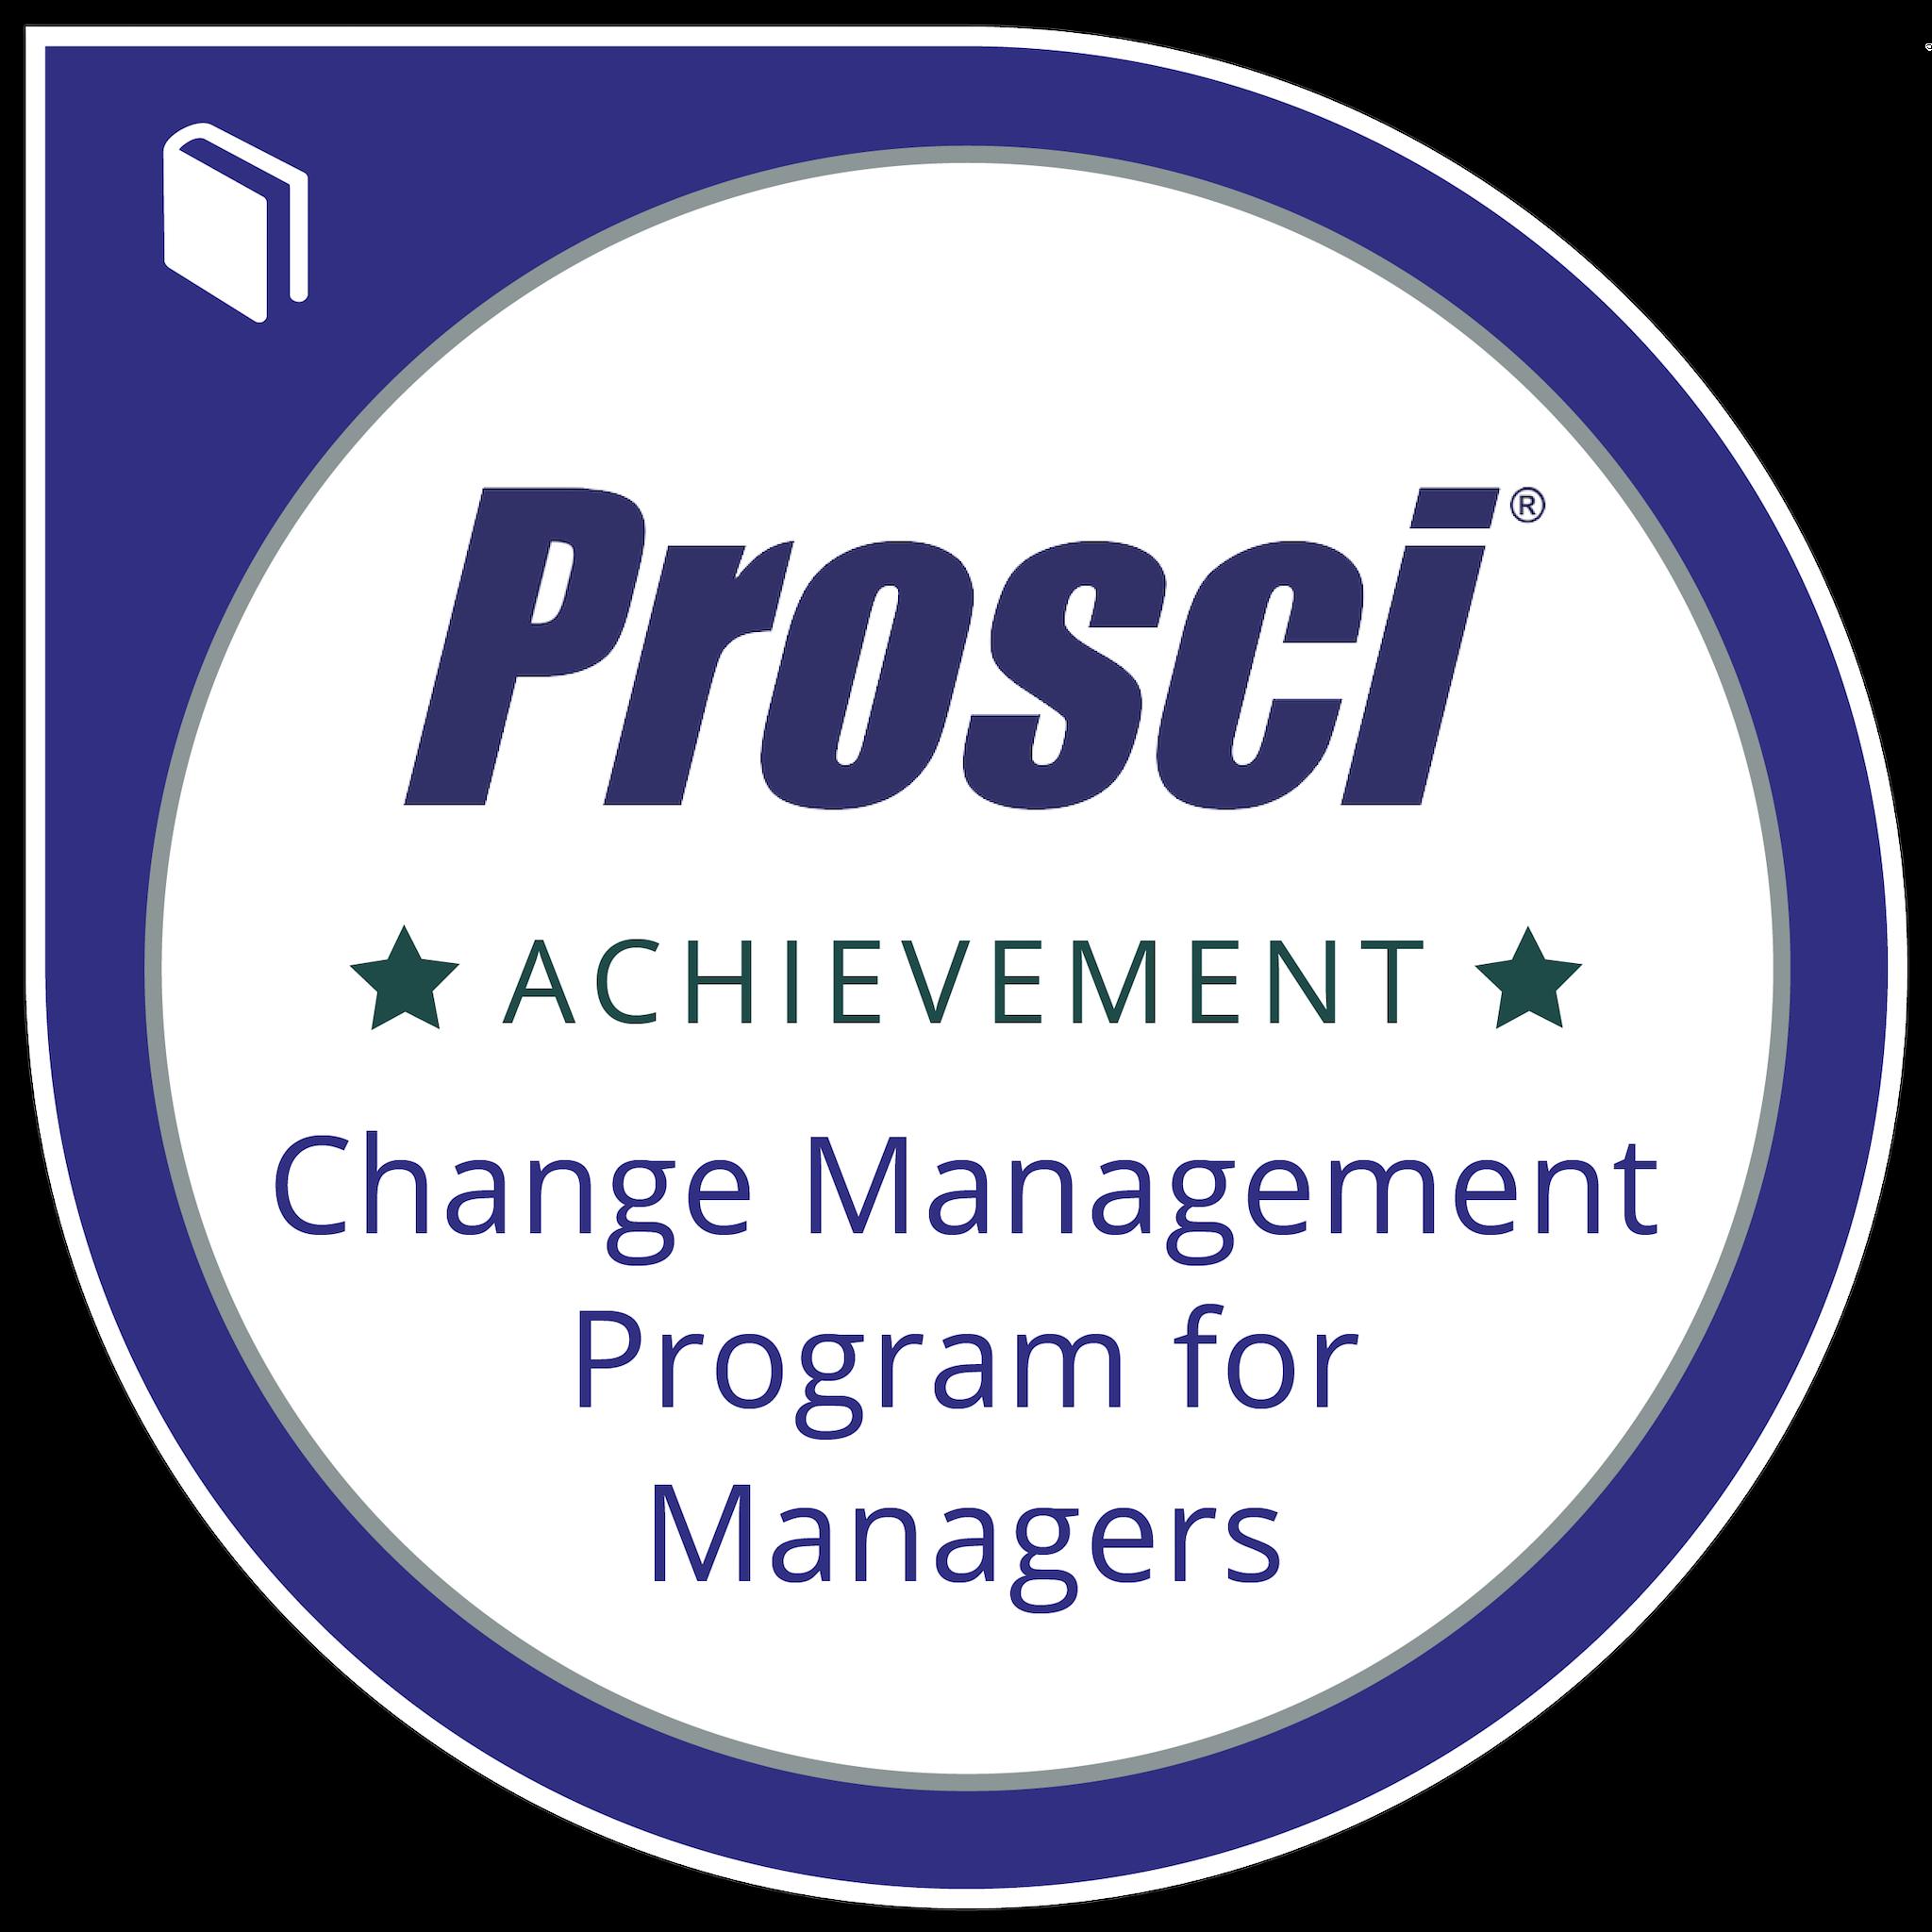 Prosci® Change Management Program for Managers